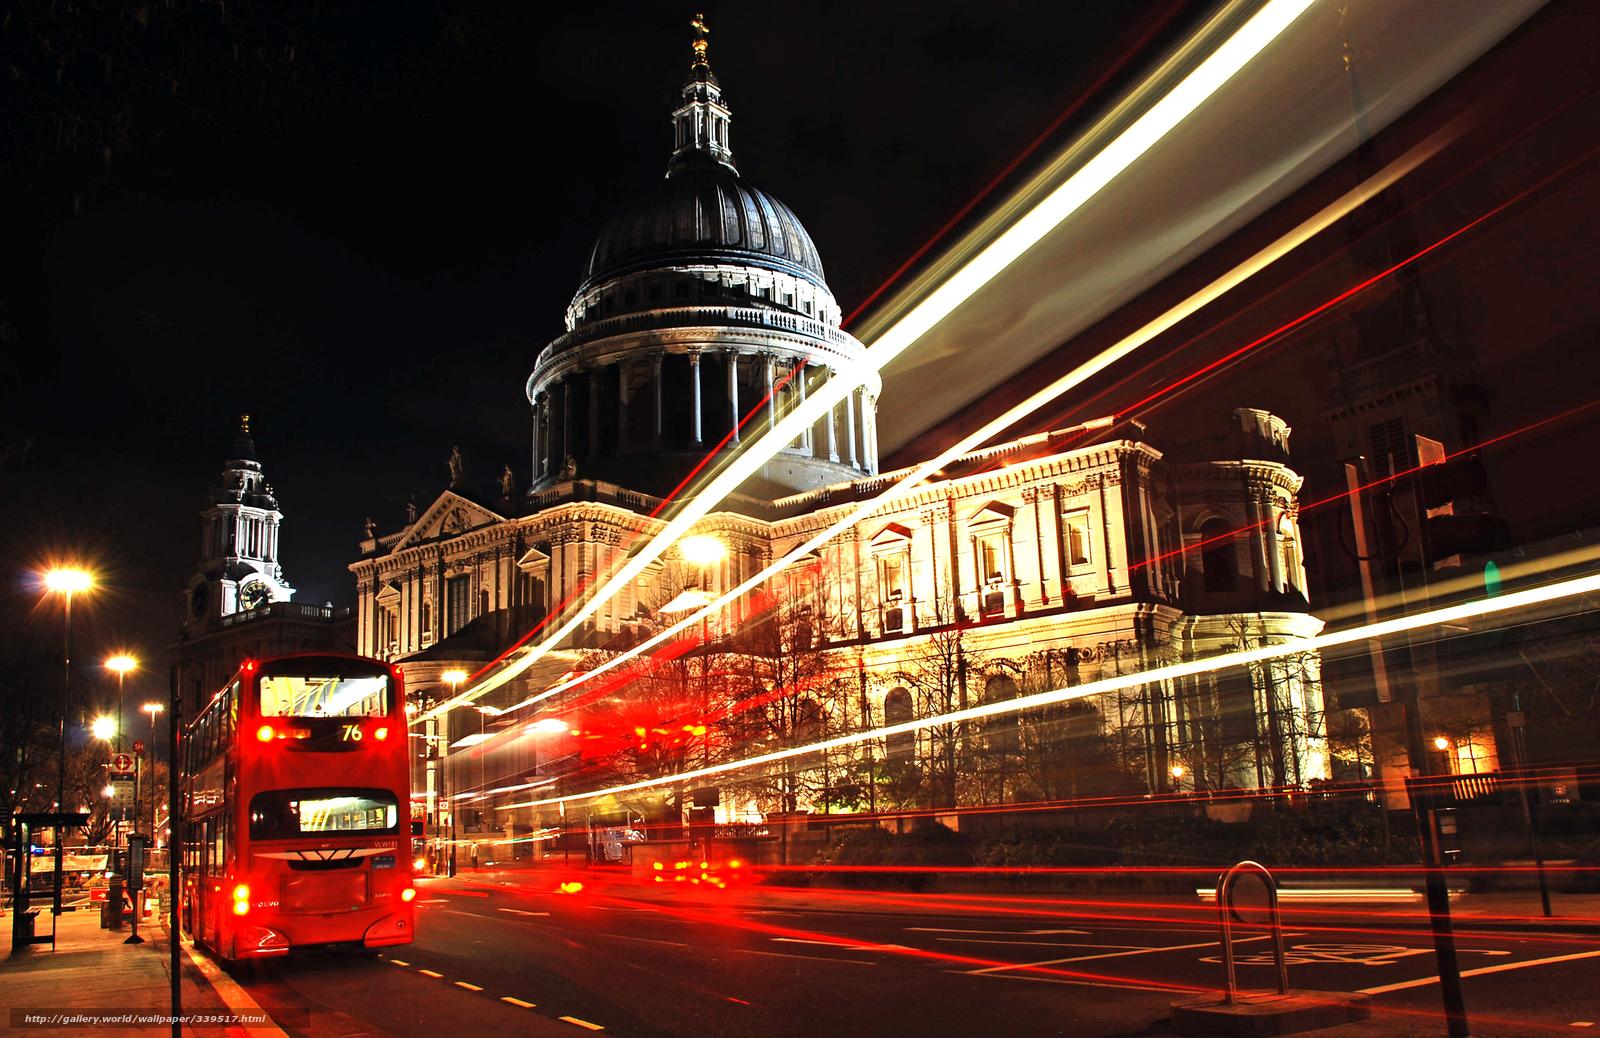 Download wallpaper London city bus night desktop wallpaper in 1600x1038